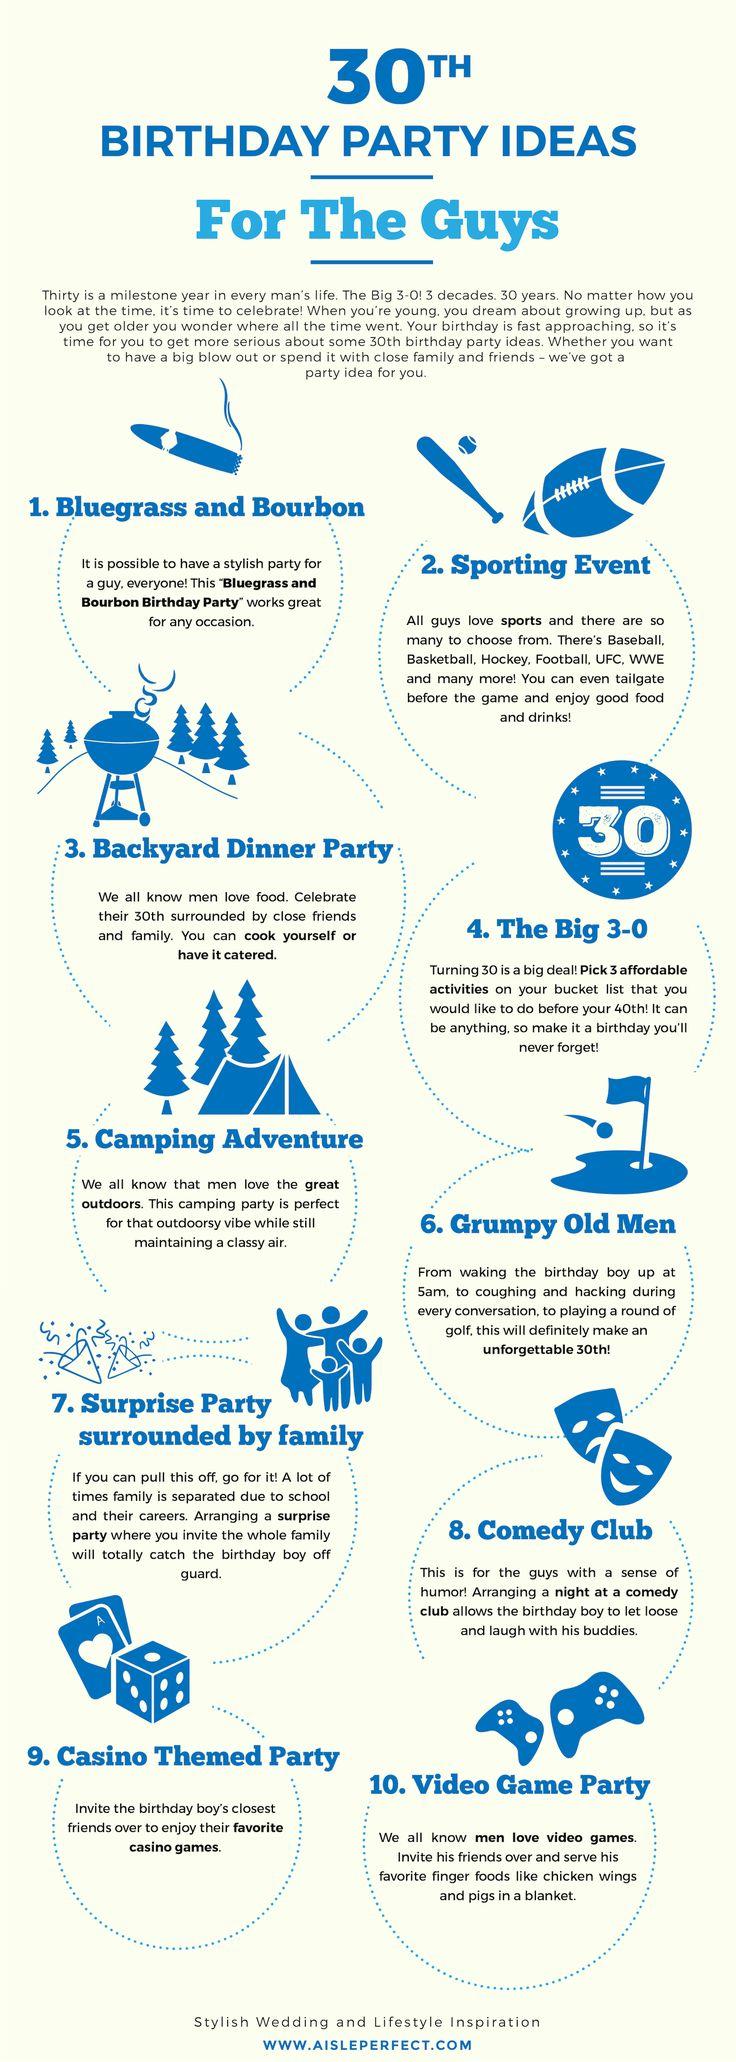 30th Birthday Ideas for Men